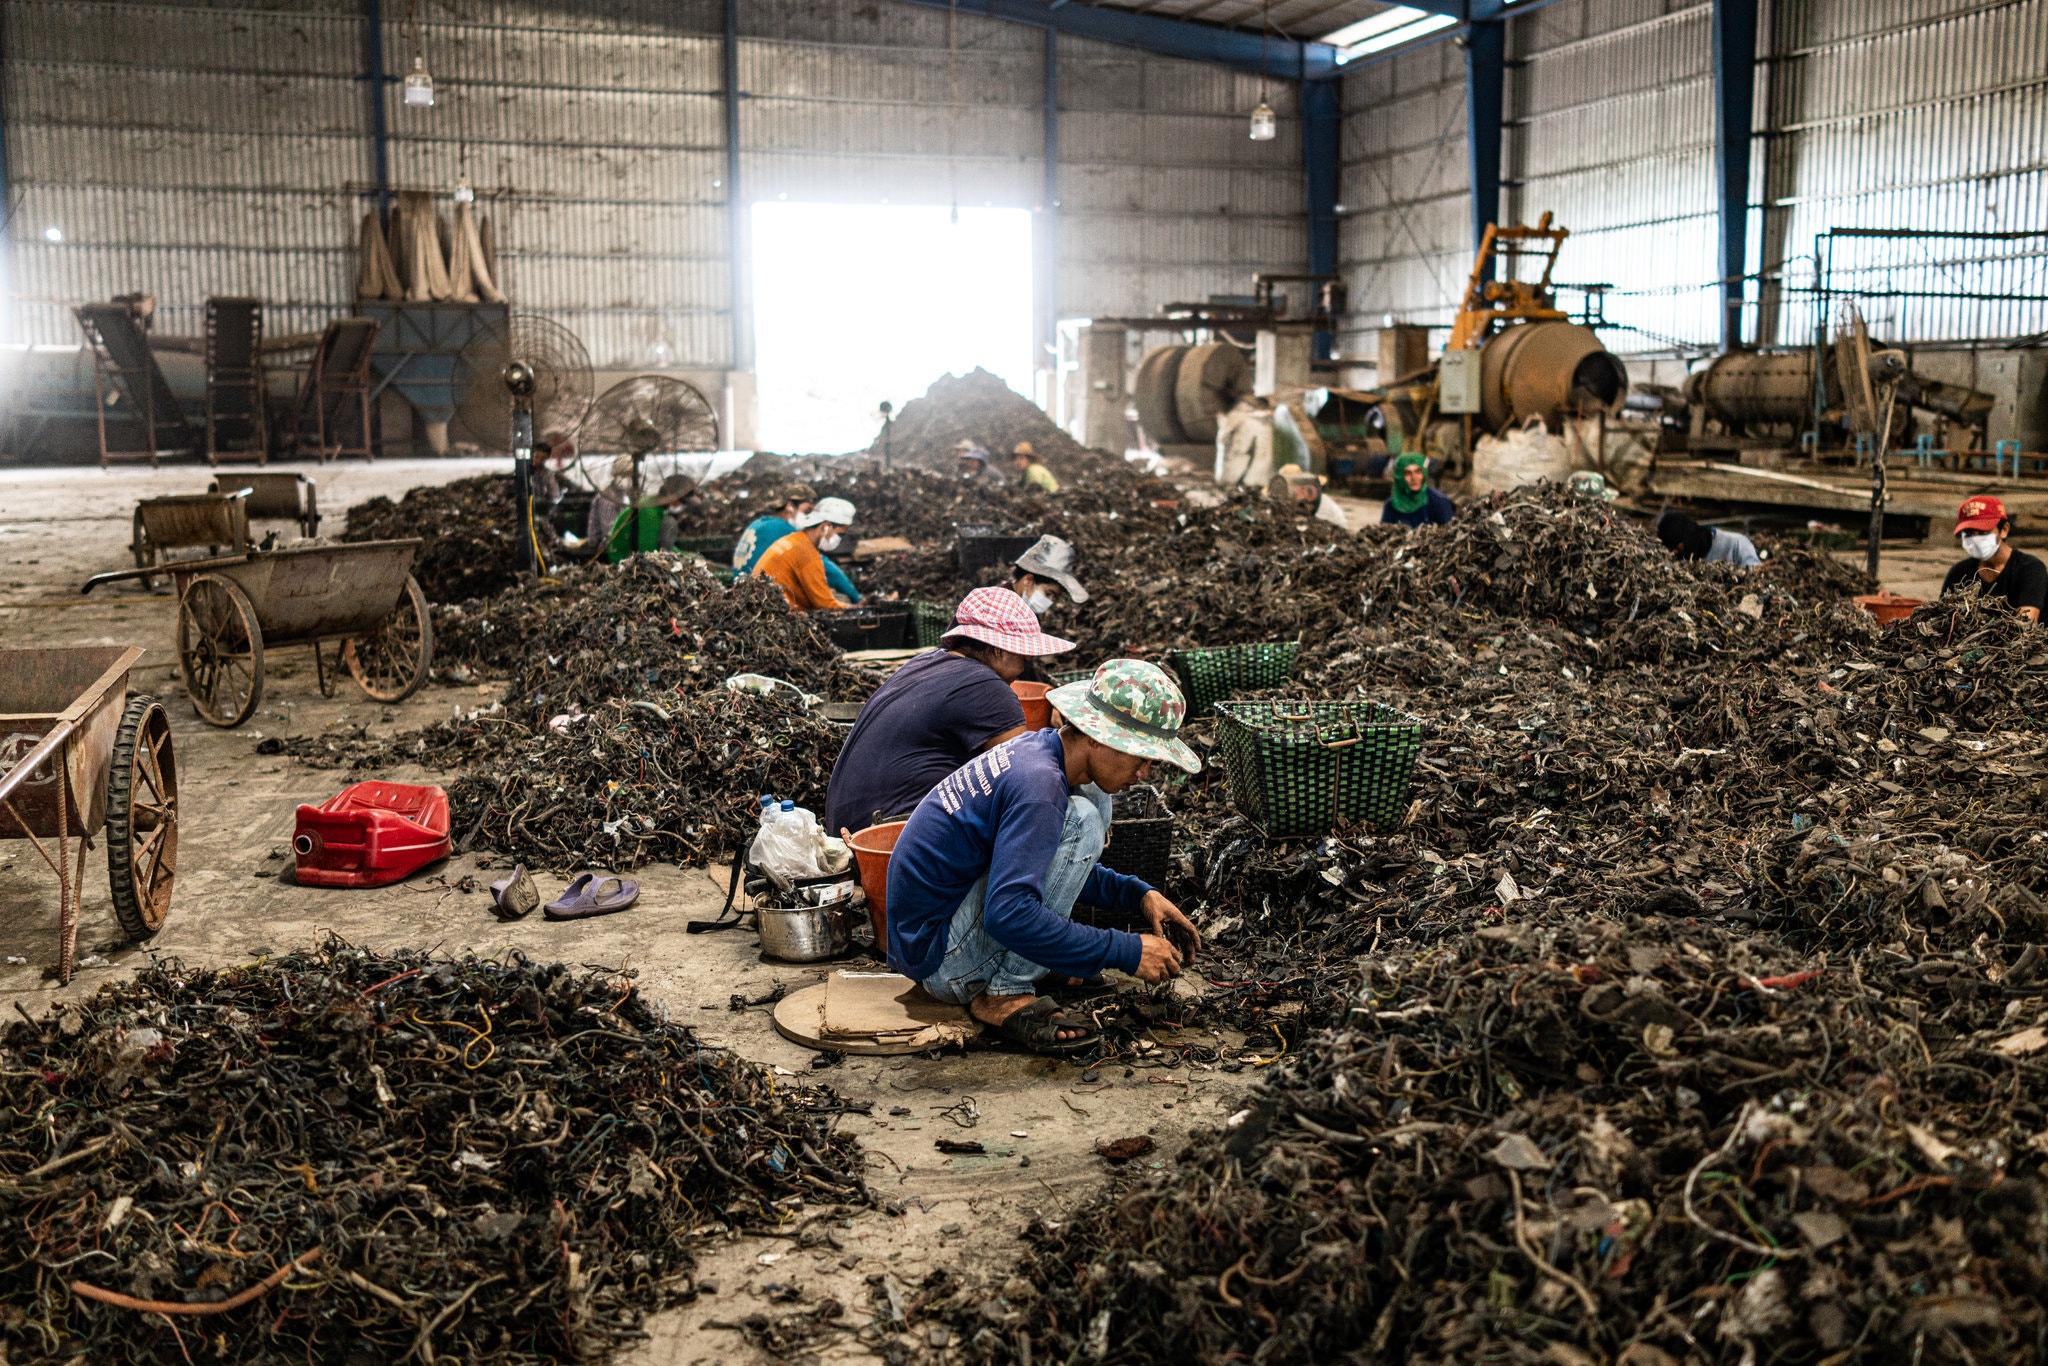 Hannah Beech,  Ryn Jirenuwat: The Price of Recycling Old Laptops